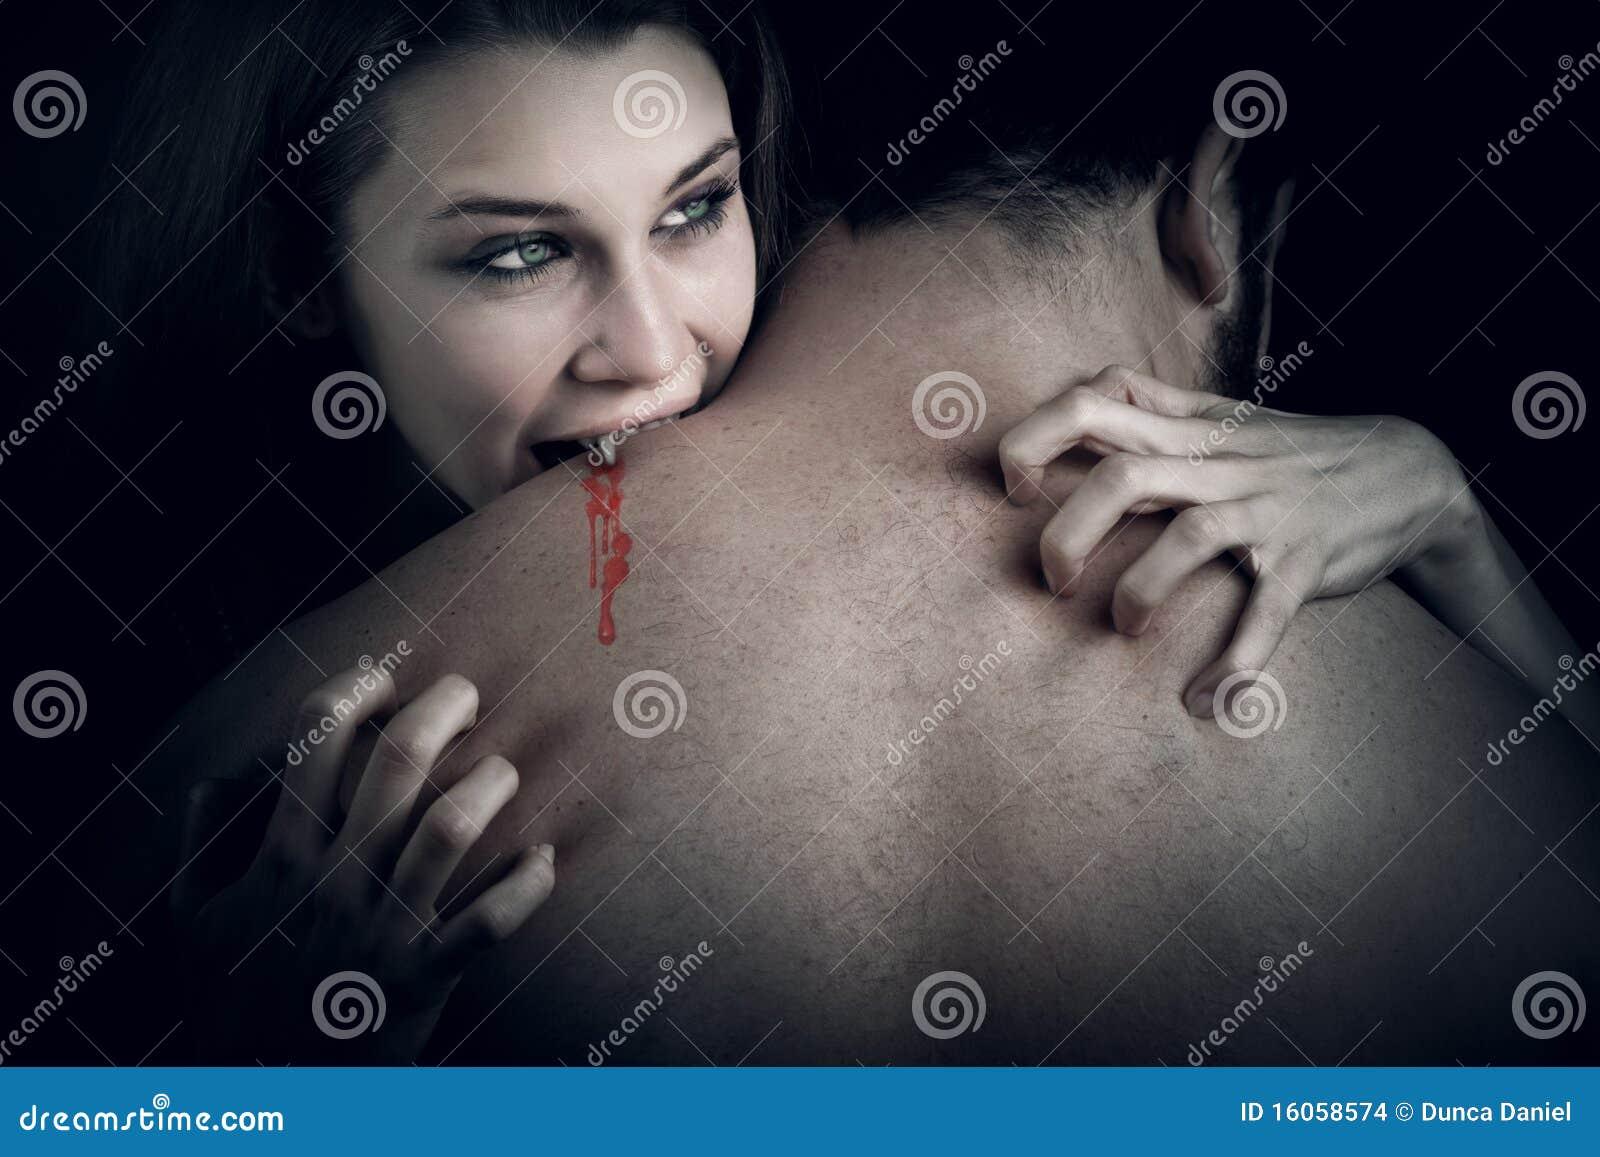 Pornal pics vampire women erotic curvy butt